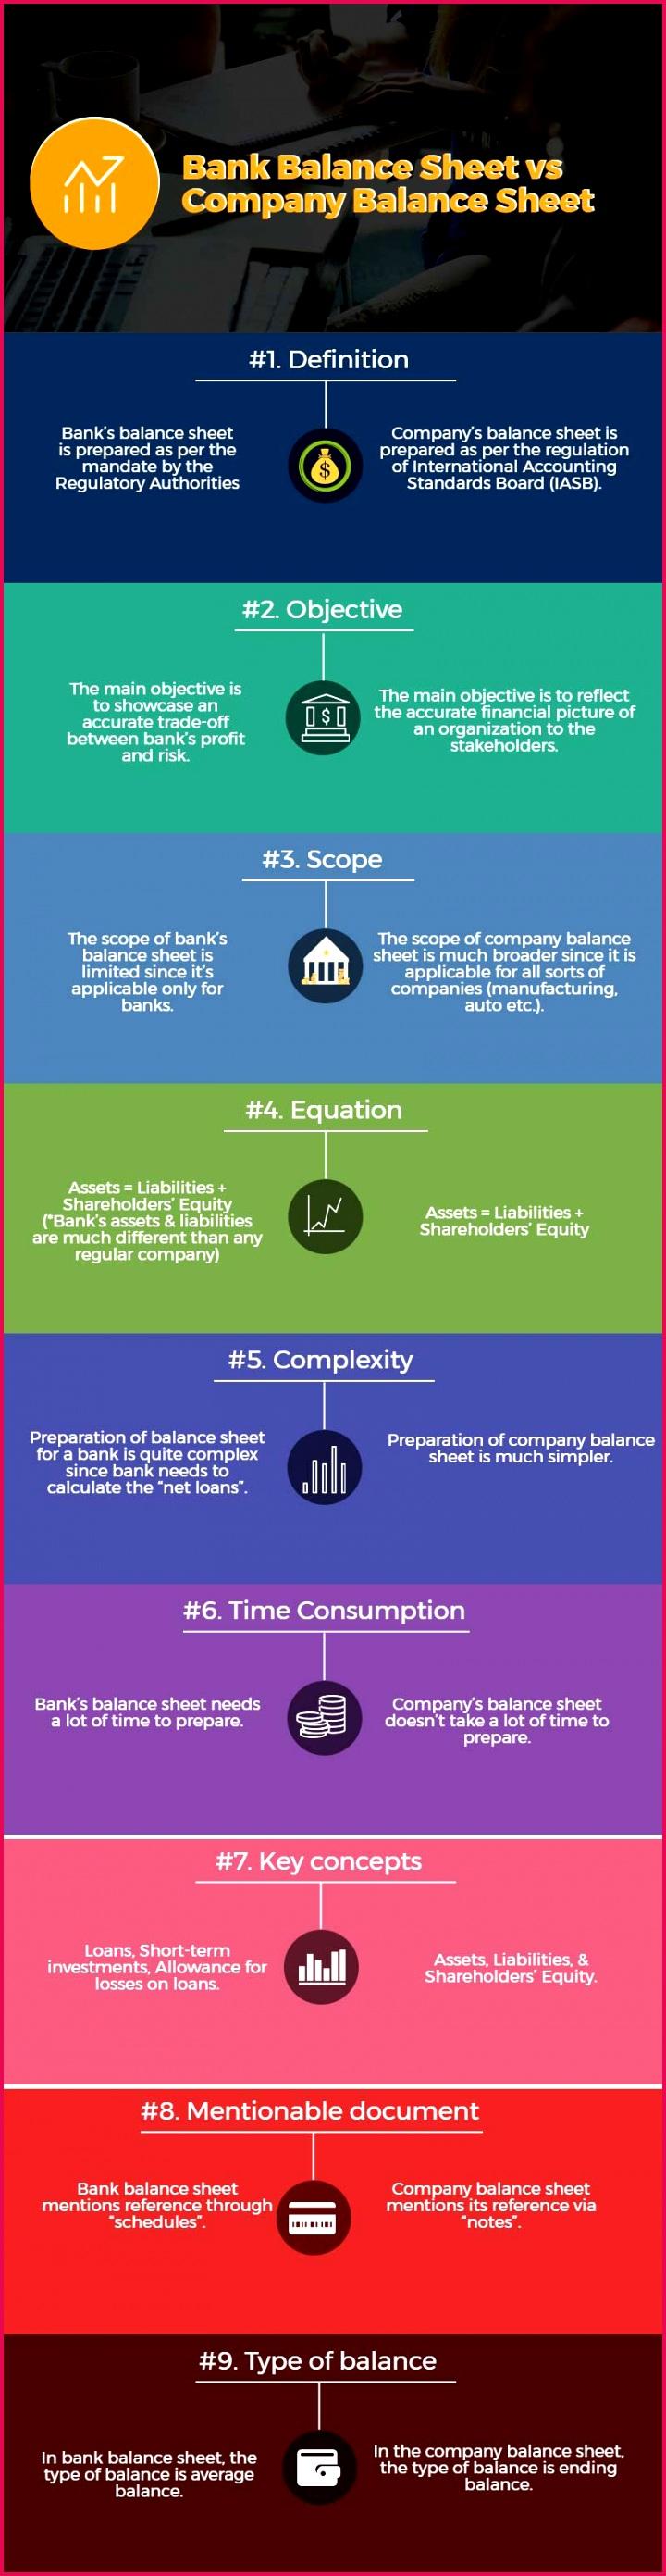 Structure of Bank s Balance Sheet